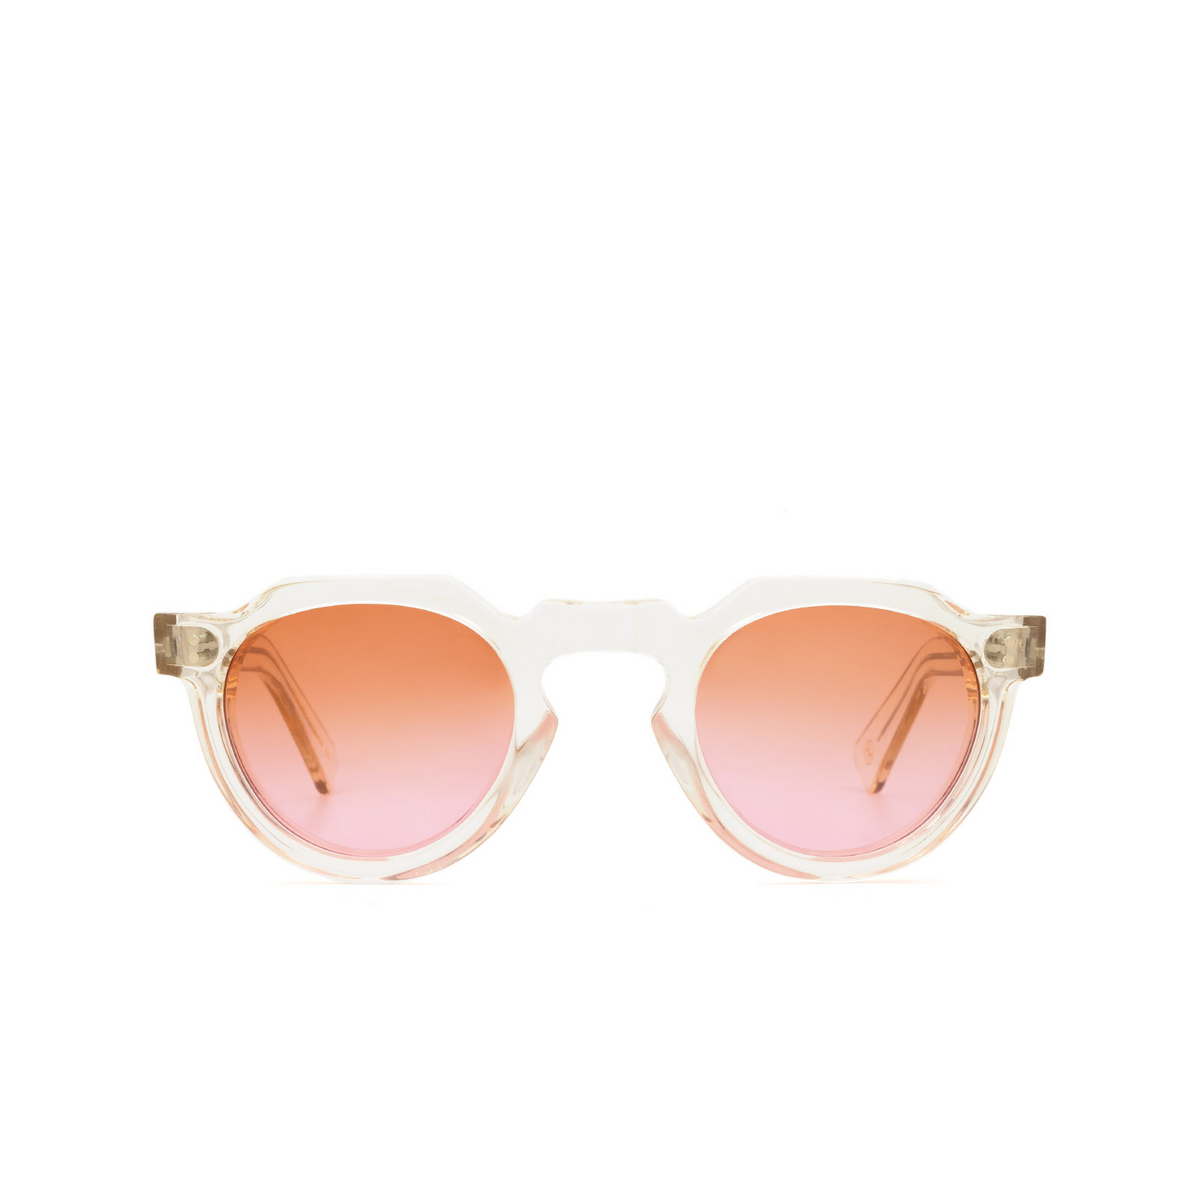 Lesca® Irregular Sunglasses: Crown Panto X Mia Burton color 21 - VISIONARY / ROMANTIC GRADIENT - front view.